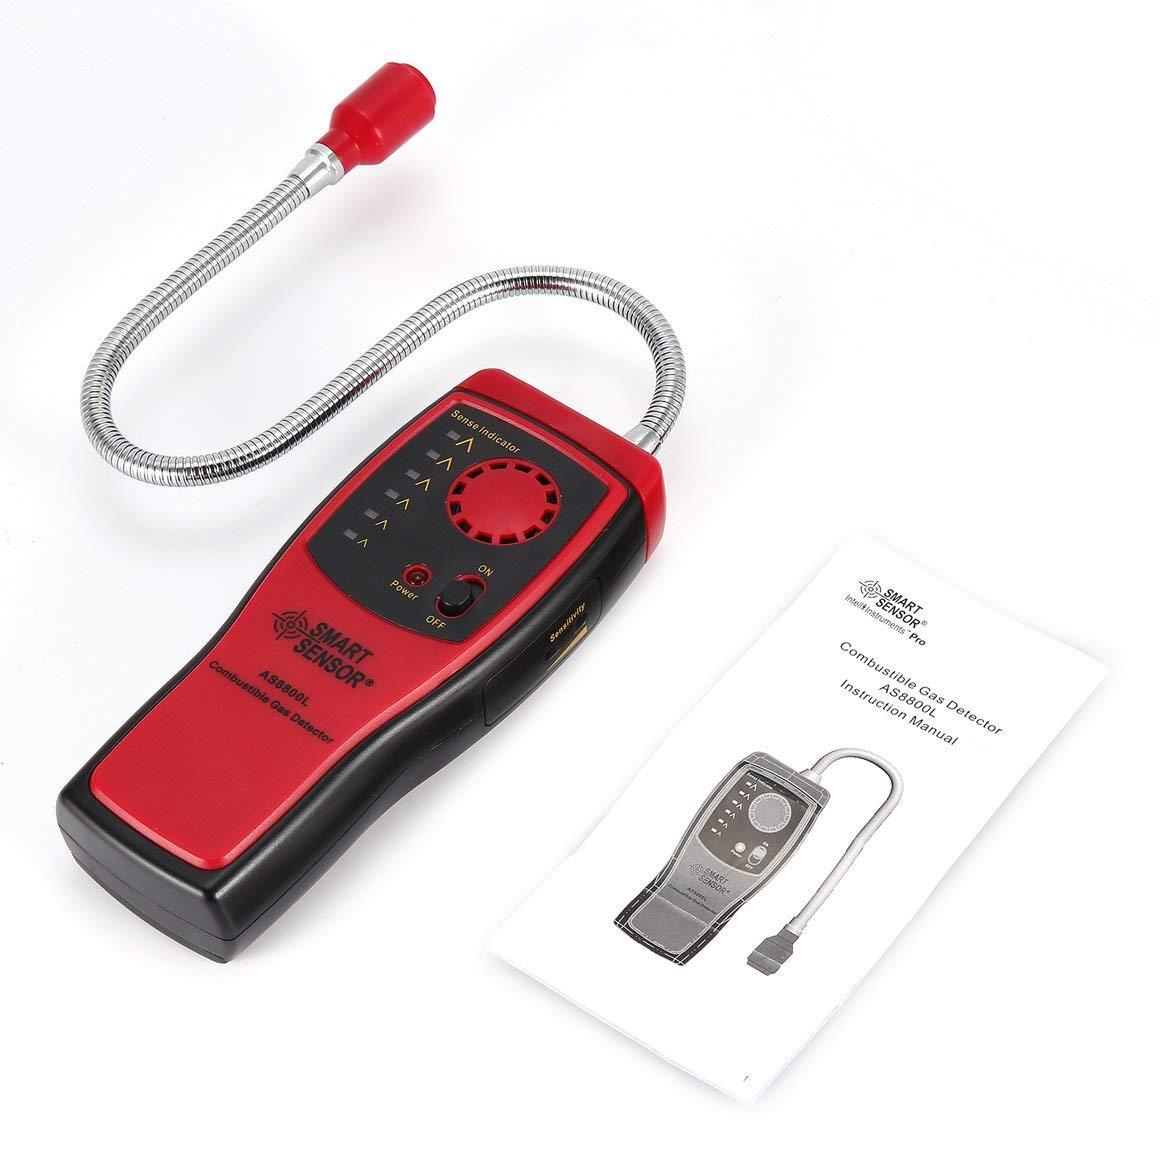 Funnyrunstore Smart Sensor AS8800L Detector de Gases de combustión Inflamador de Fugas de Gas Natural Herramienta Analizador de detectores de Fugas de Gas ...